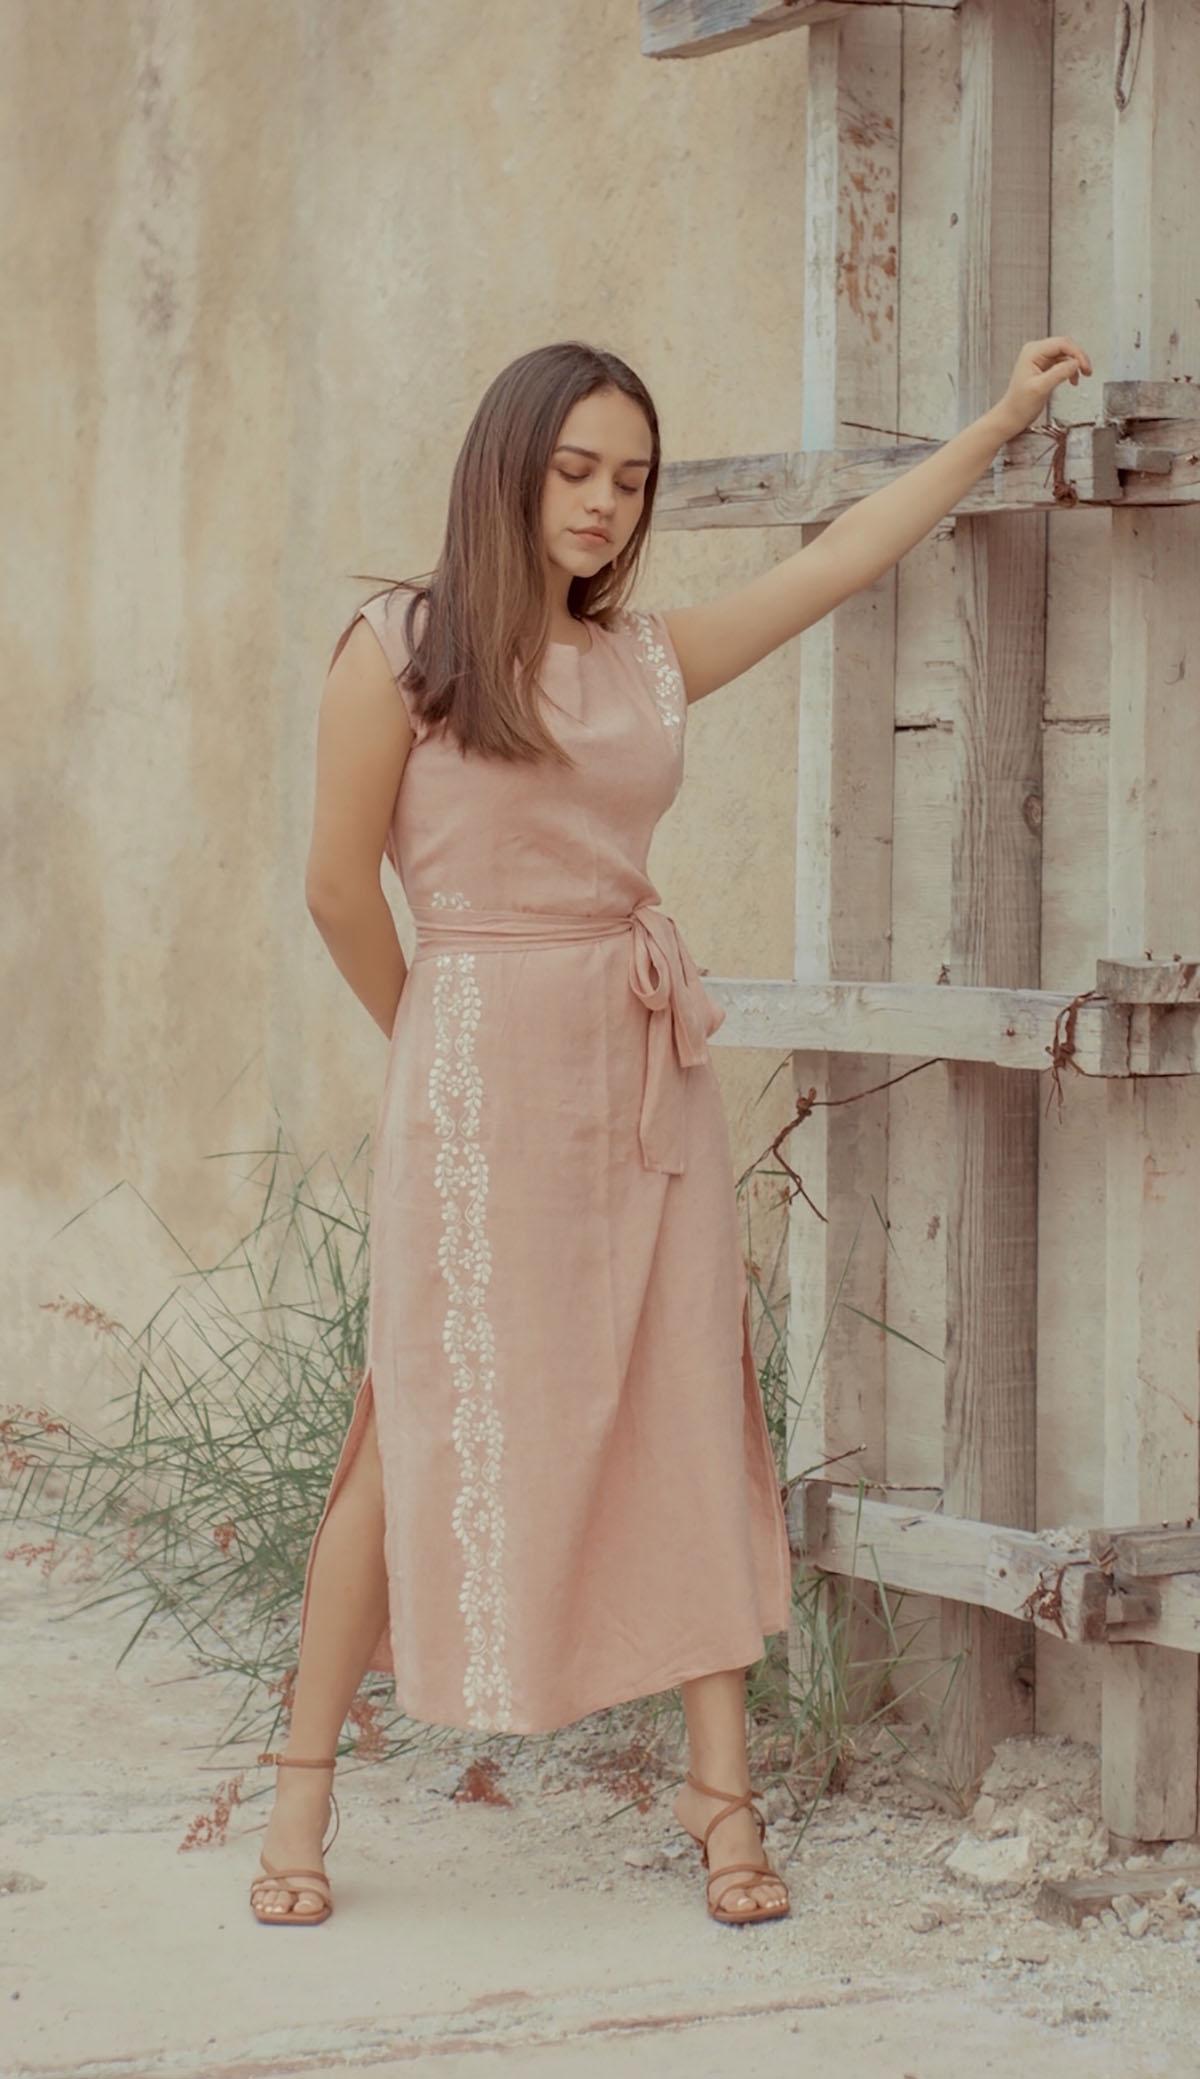 Flavia Palo de rosa